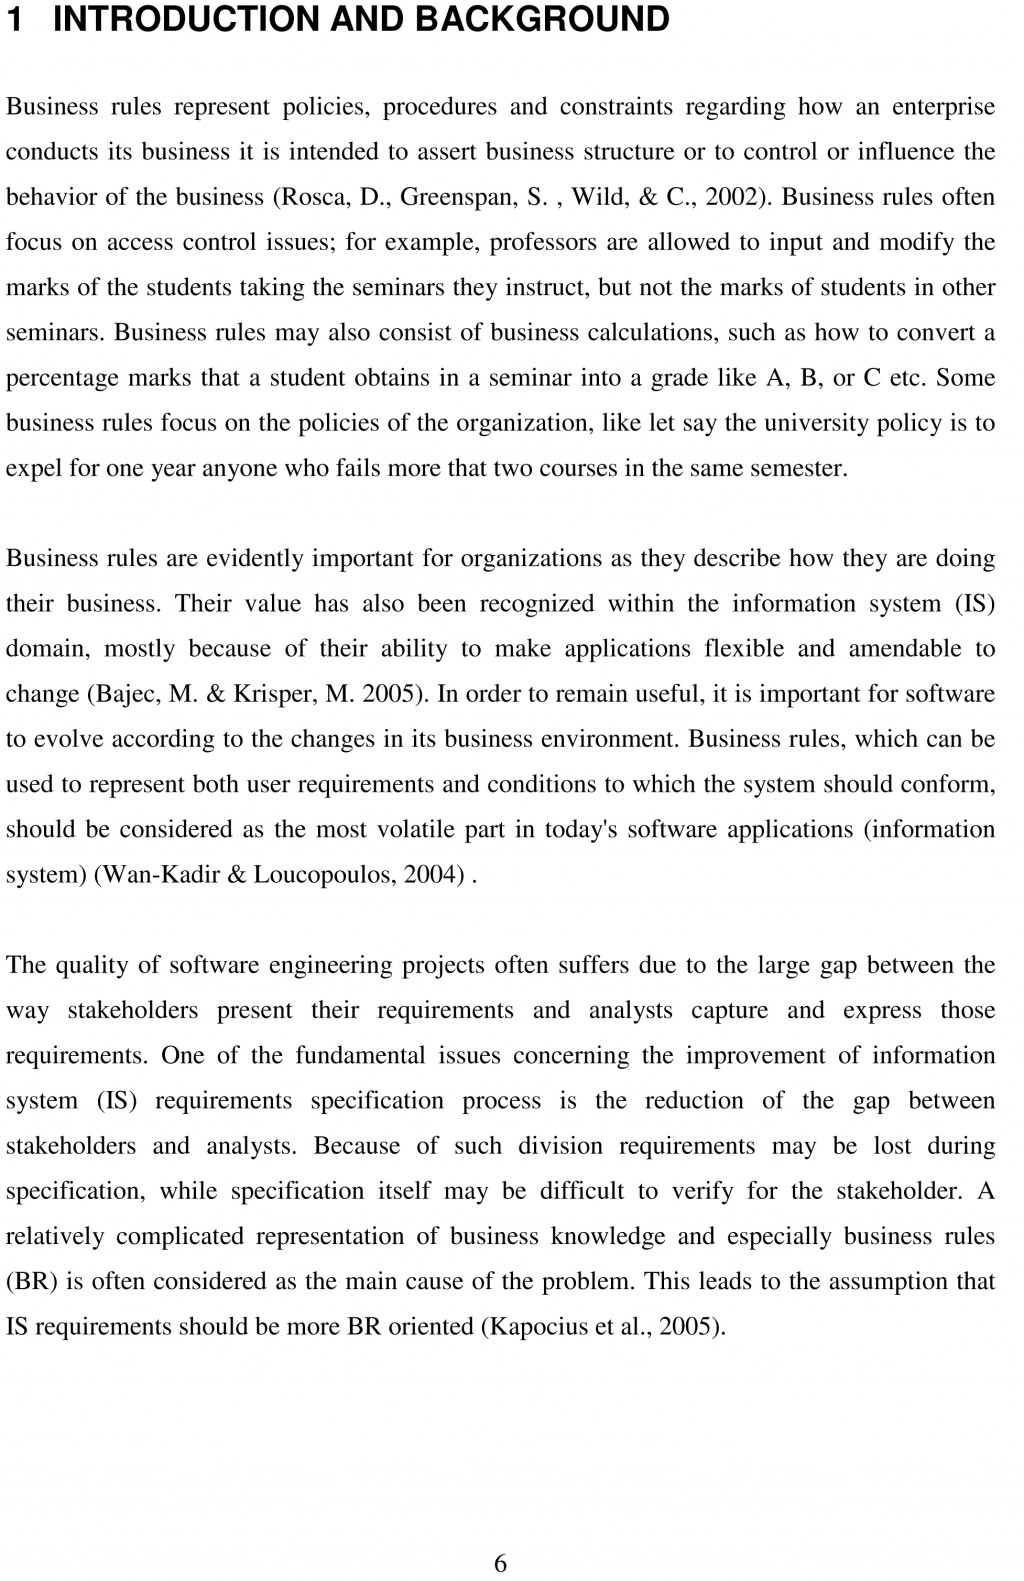 012 Essay Example Sample Act Essays Thesis Wonderful New Writing Large